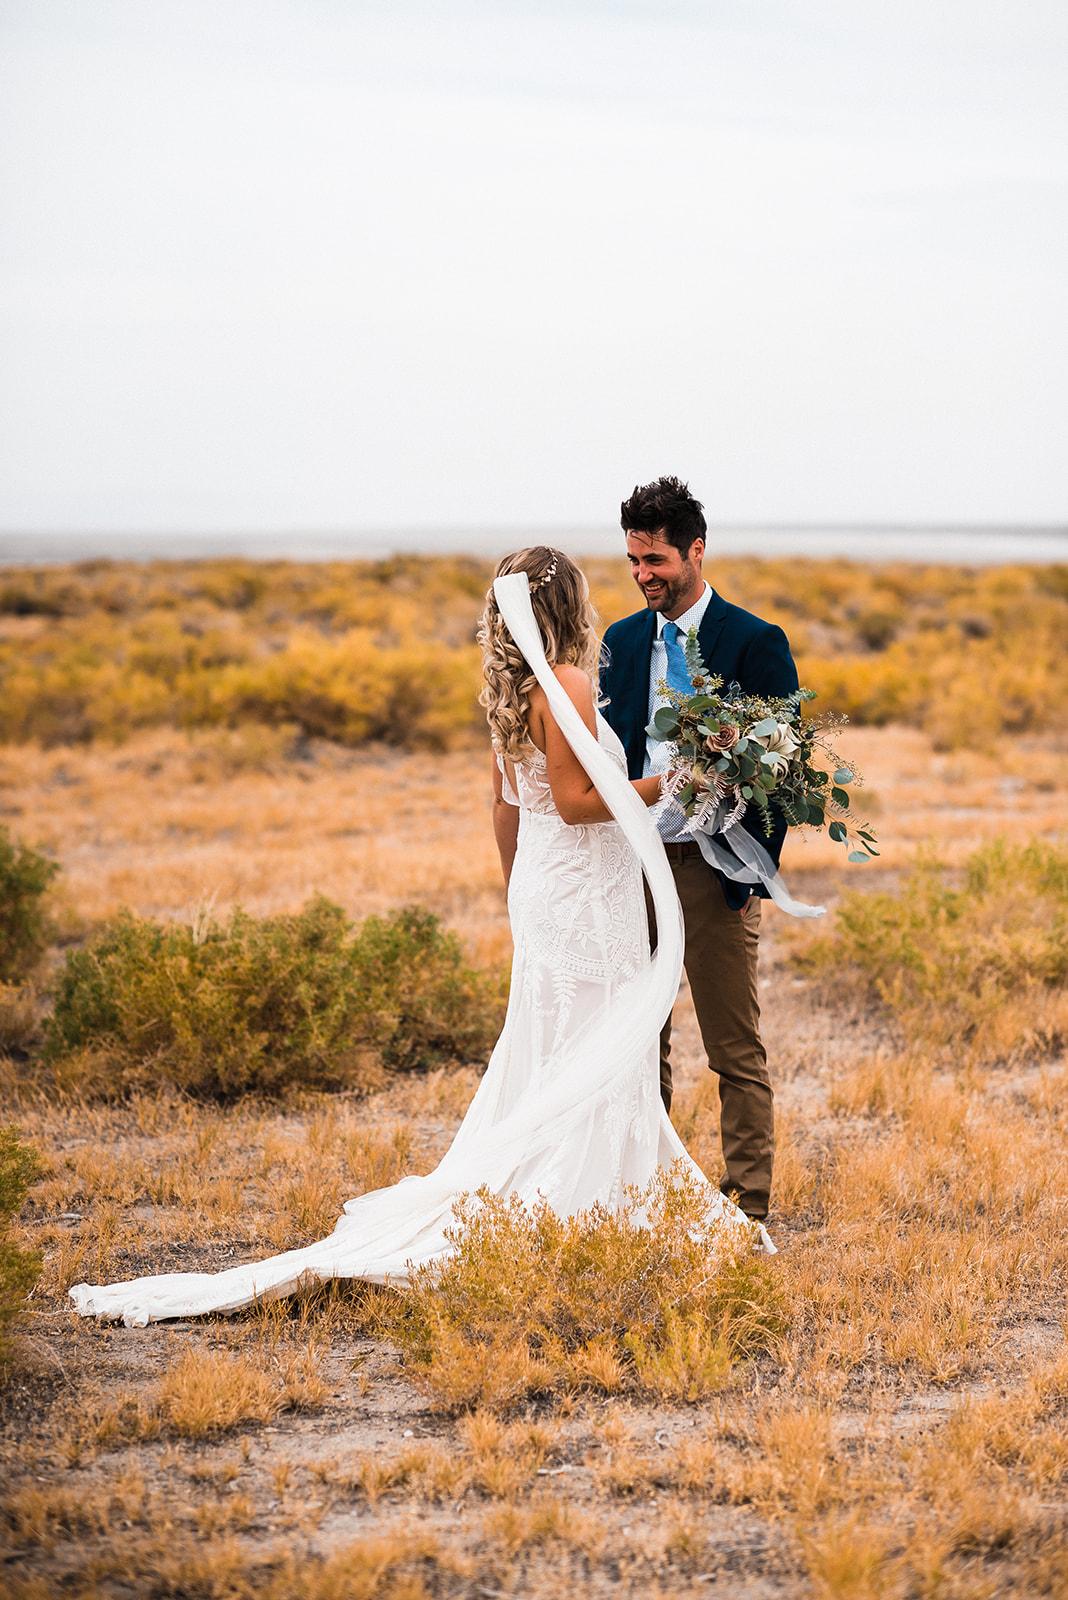 Madison_Guy_Wedding_The_Foxes_Photography_097.jpg